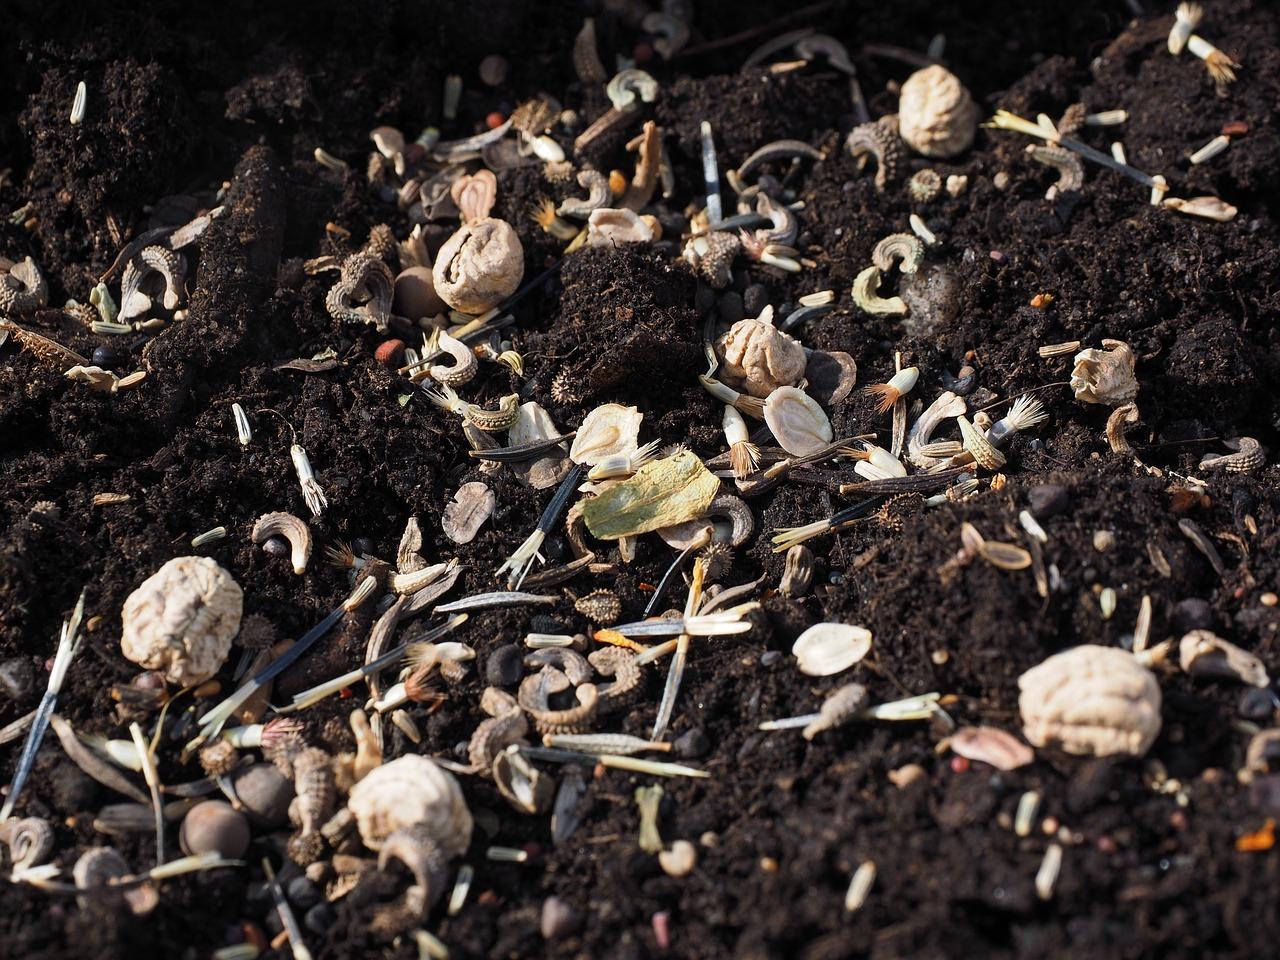 Семена Цветов Семян Посев - Бесплатное фото на Pixabay